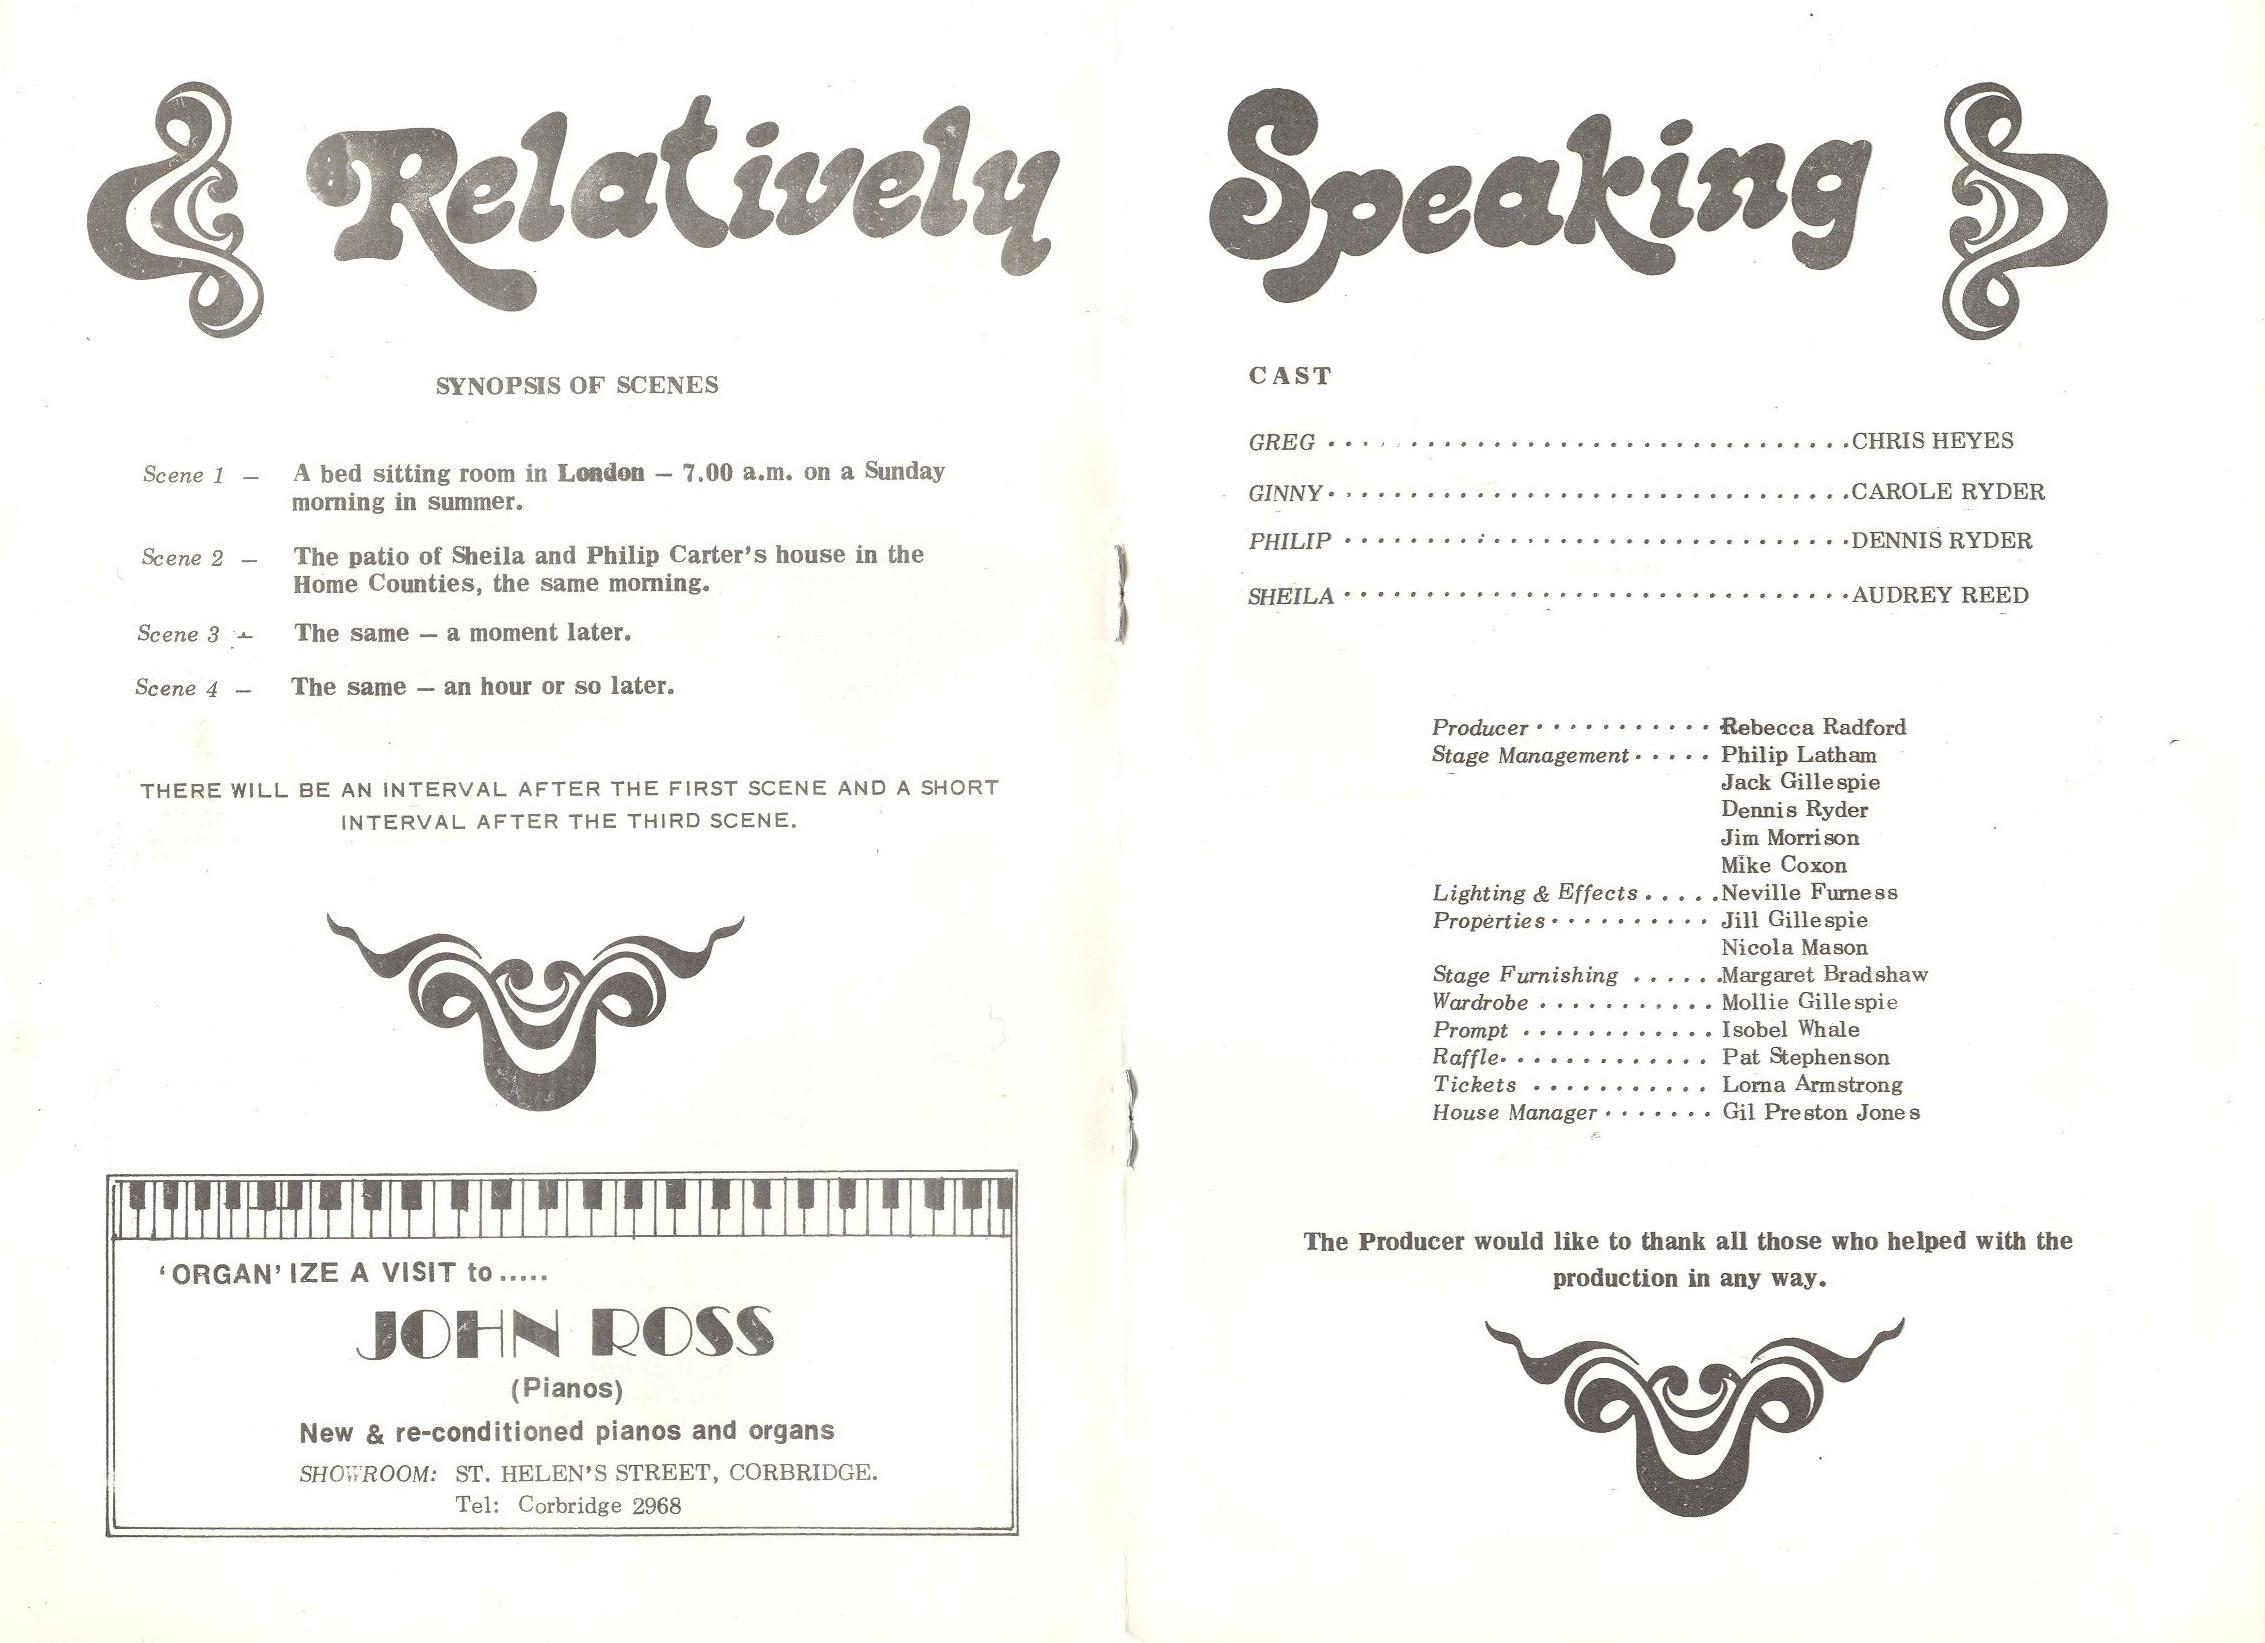 1977 Riding Mill Drama Club, Relatively